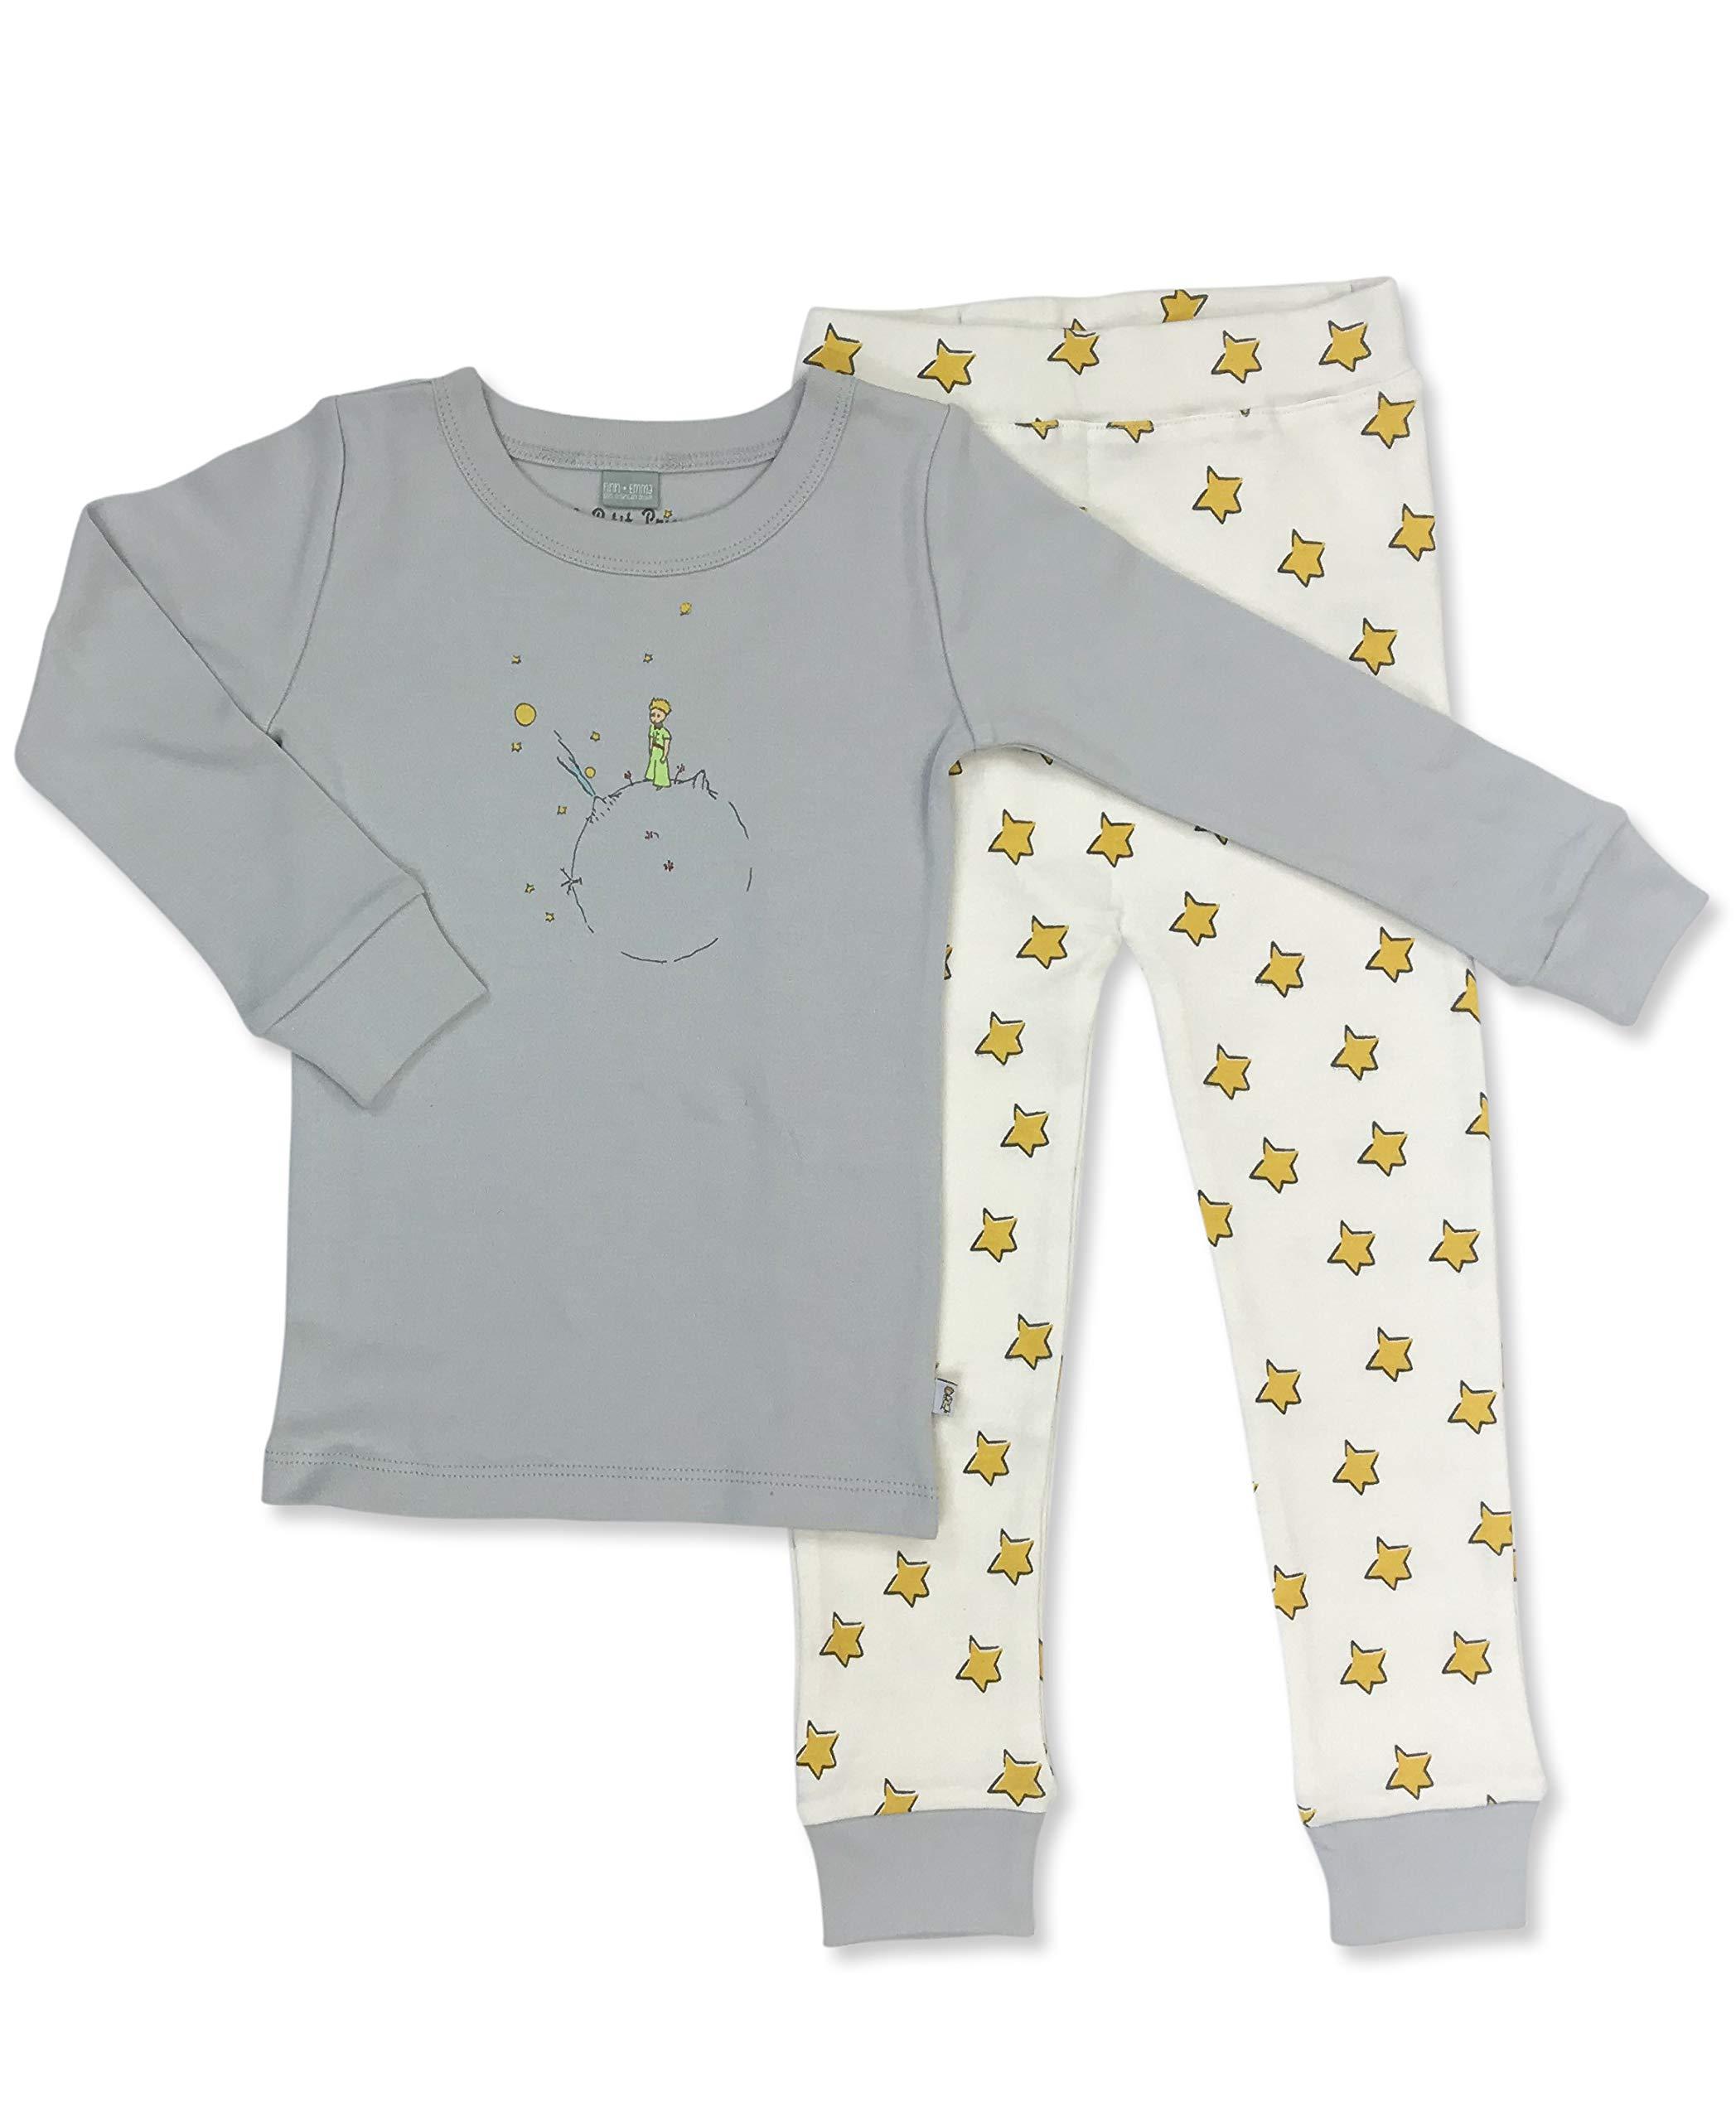 Finn + Emma Little Prince Organic Cotton Toddler Pajama Sleep Set – Gray Top & Yellow Stars Pants, 3T